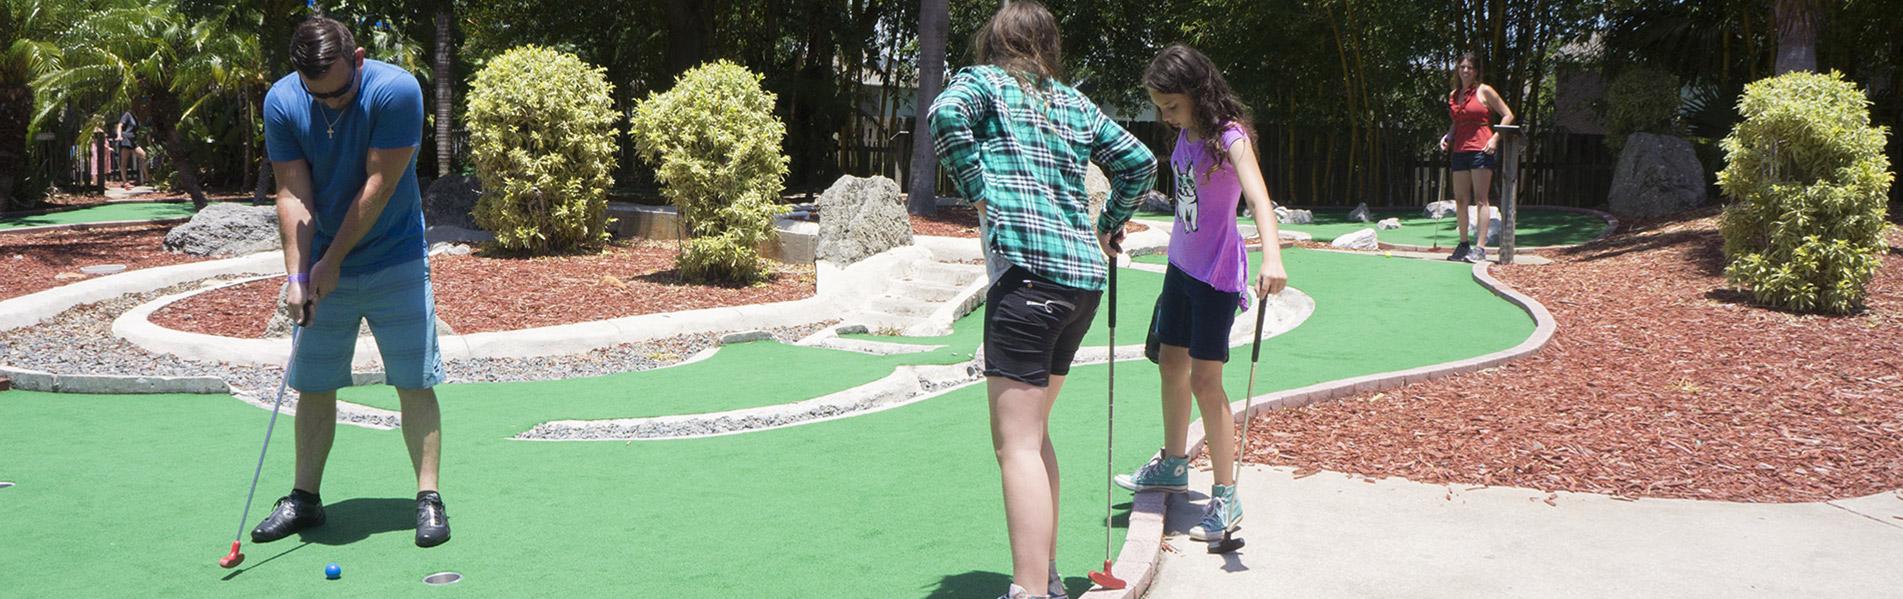 Putt Putt Golf Melbourne Florida